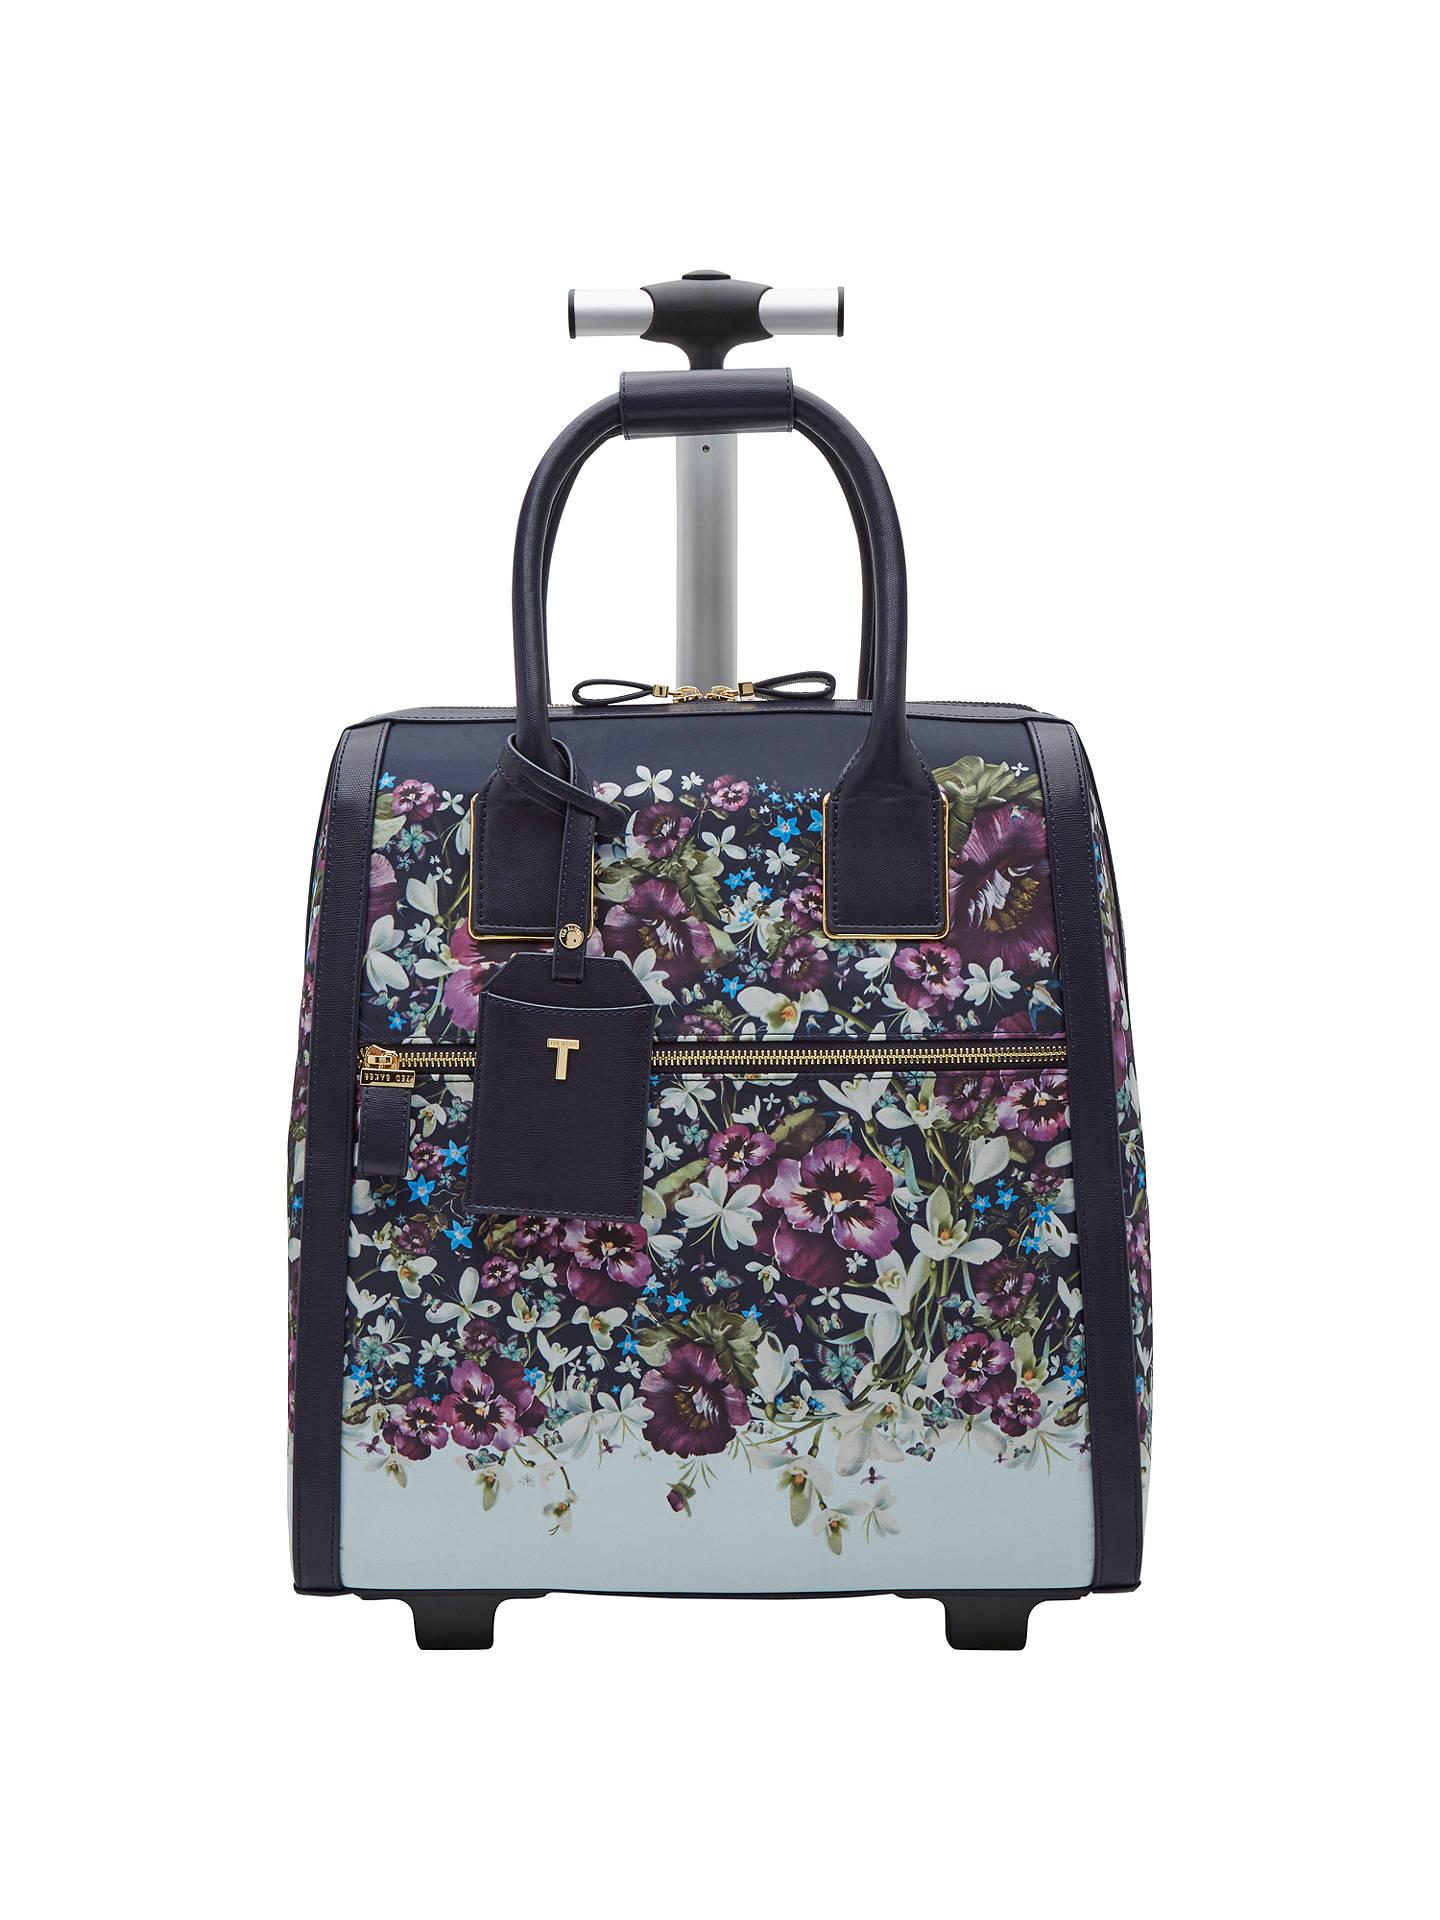 87b902ee474a BuyTed Baker Jaki Entangled Enchantment Travel Bag